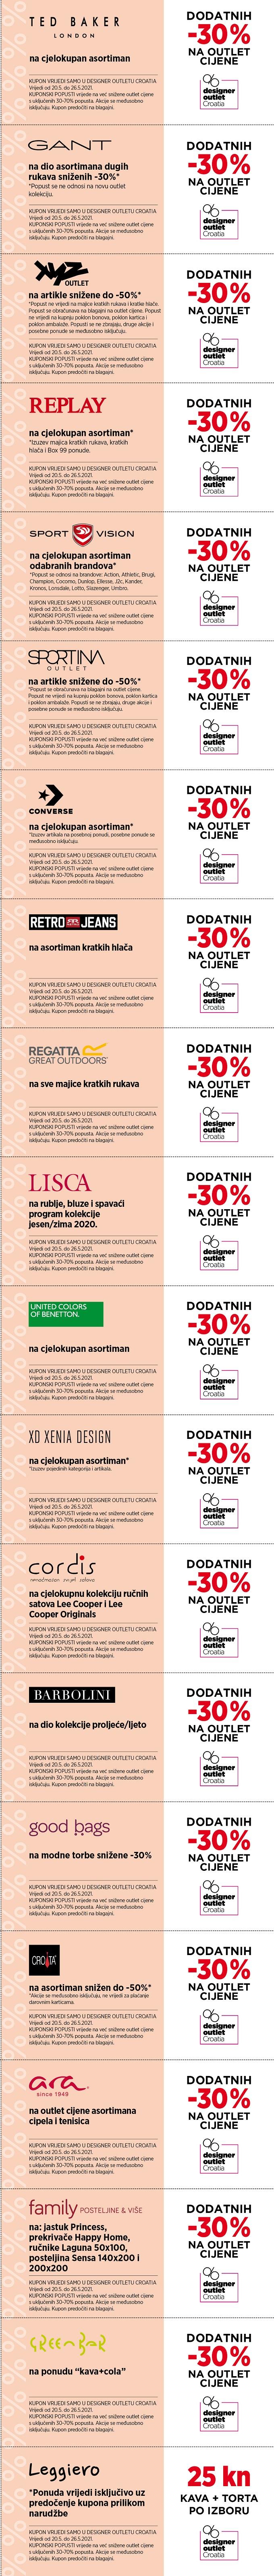 Gloria kuponi designer outlet croatia 2